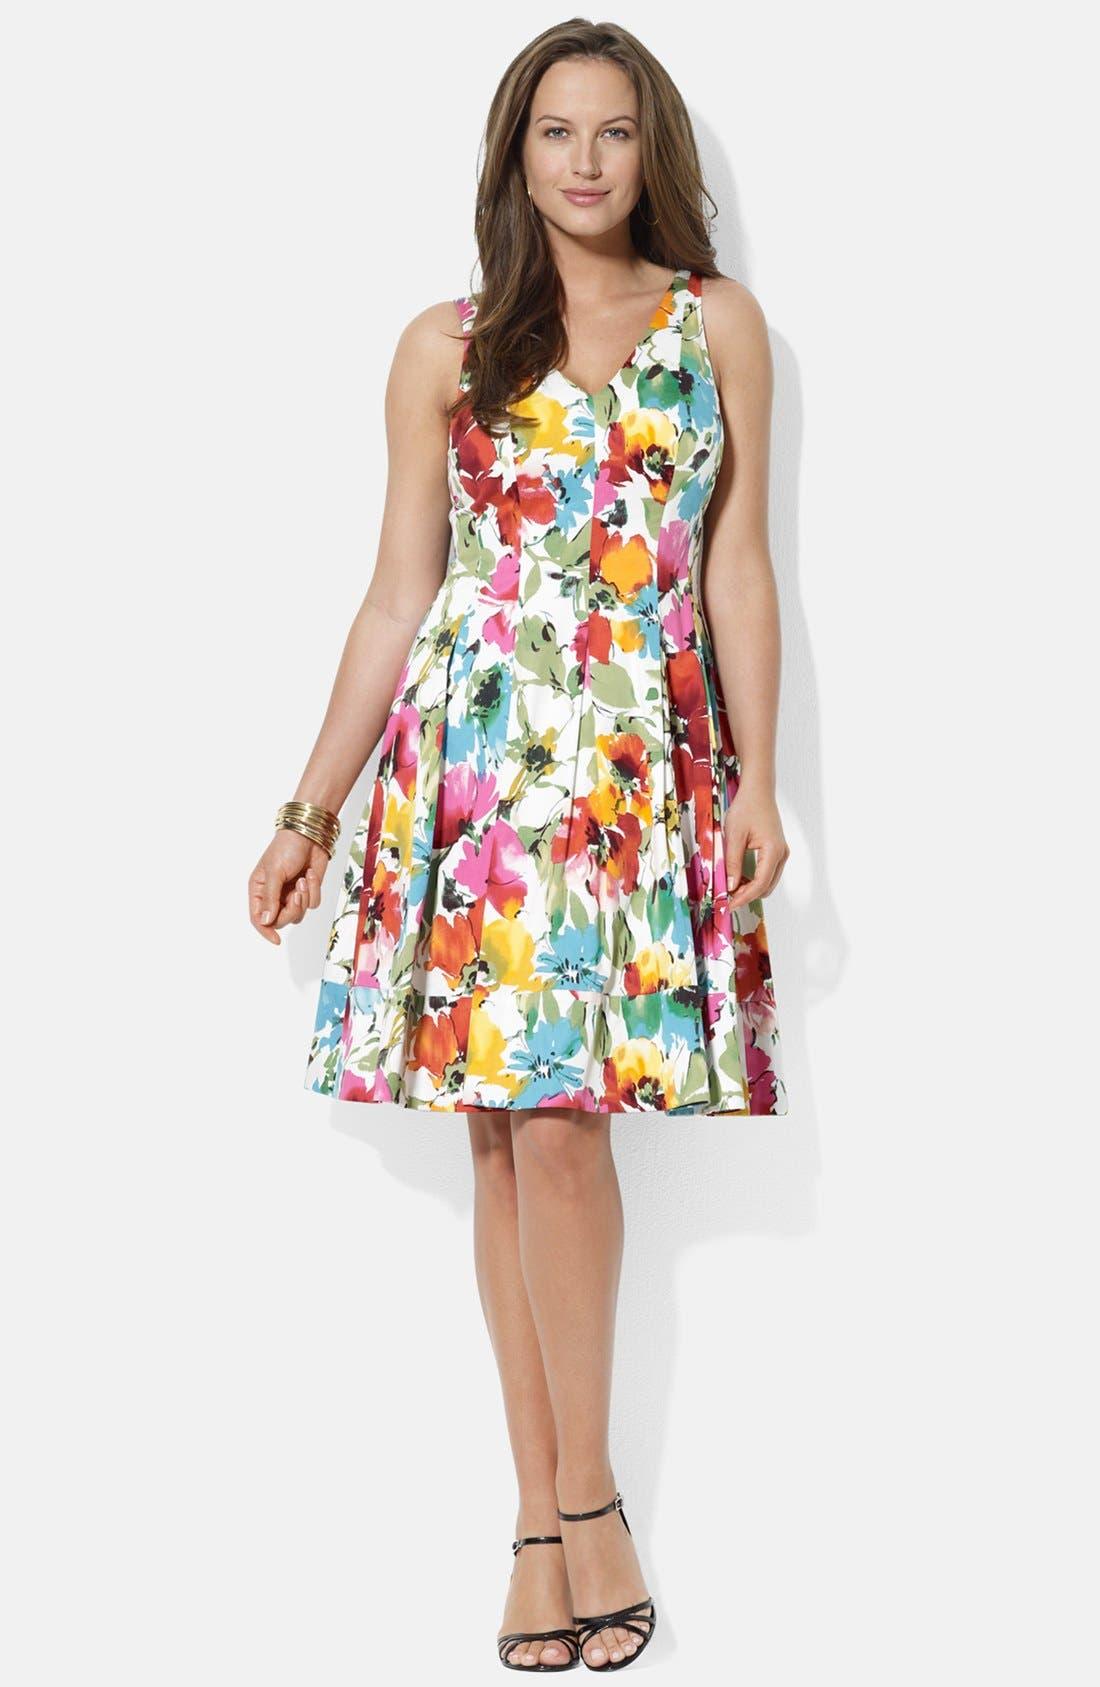 Alternate Image 1 Selected - Lauren Ralph Lauren V-Neck Floral Print Sundress (Plus Size)